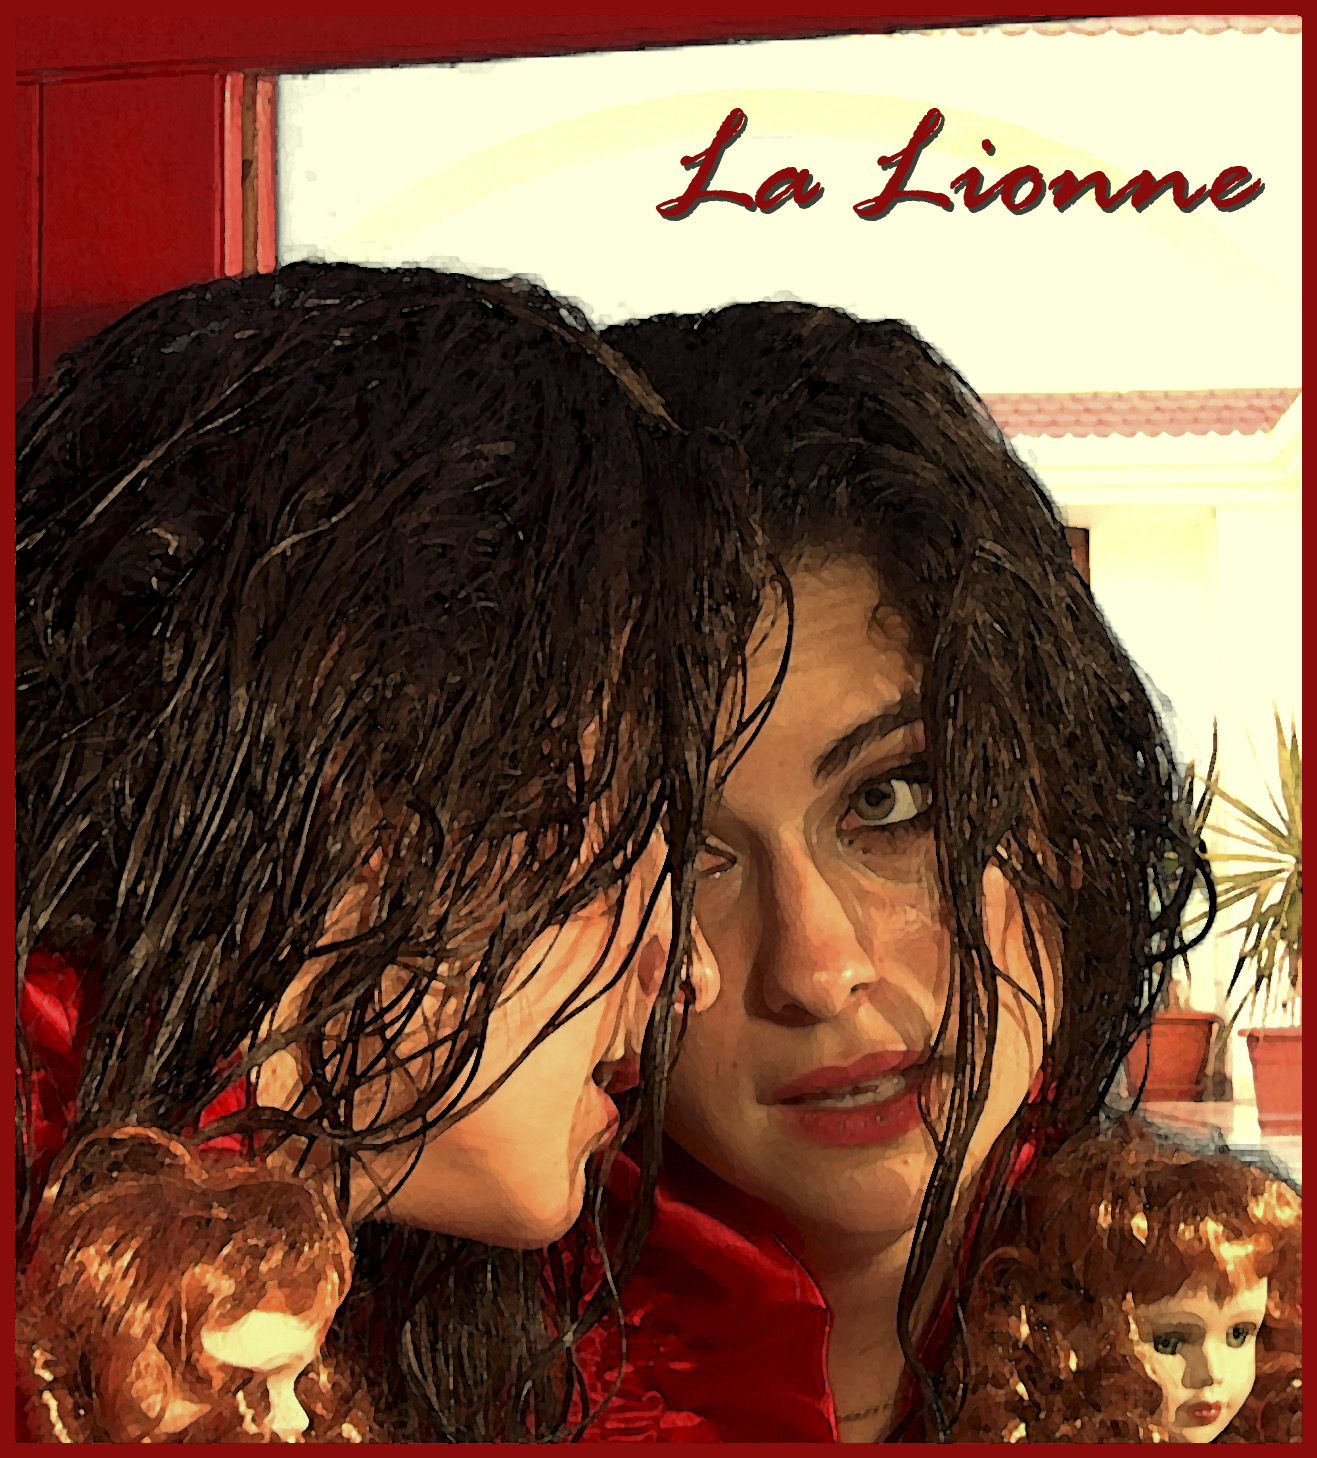 http://www.lejournaldepersonne.com/wp-content/uploads/2012/08/lalionne.jpg